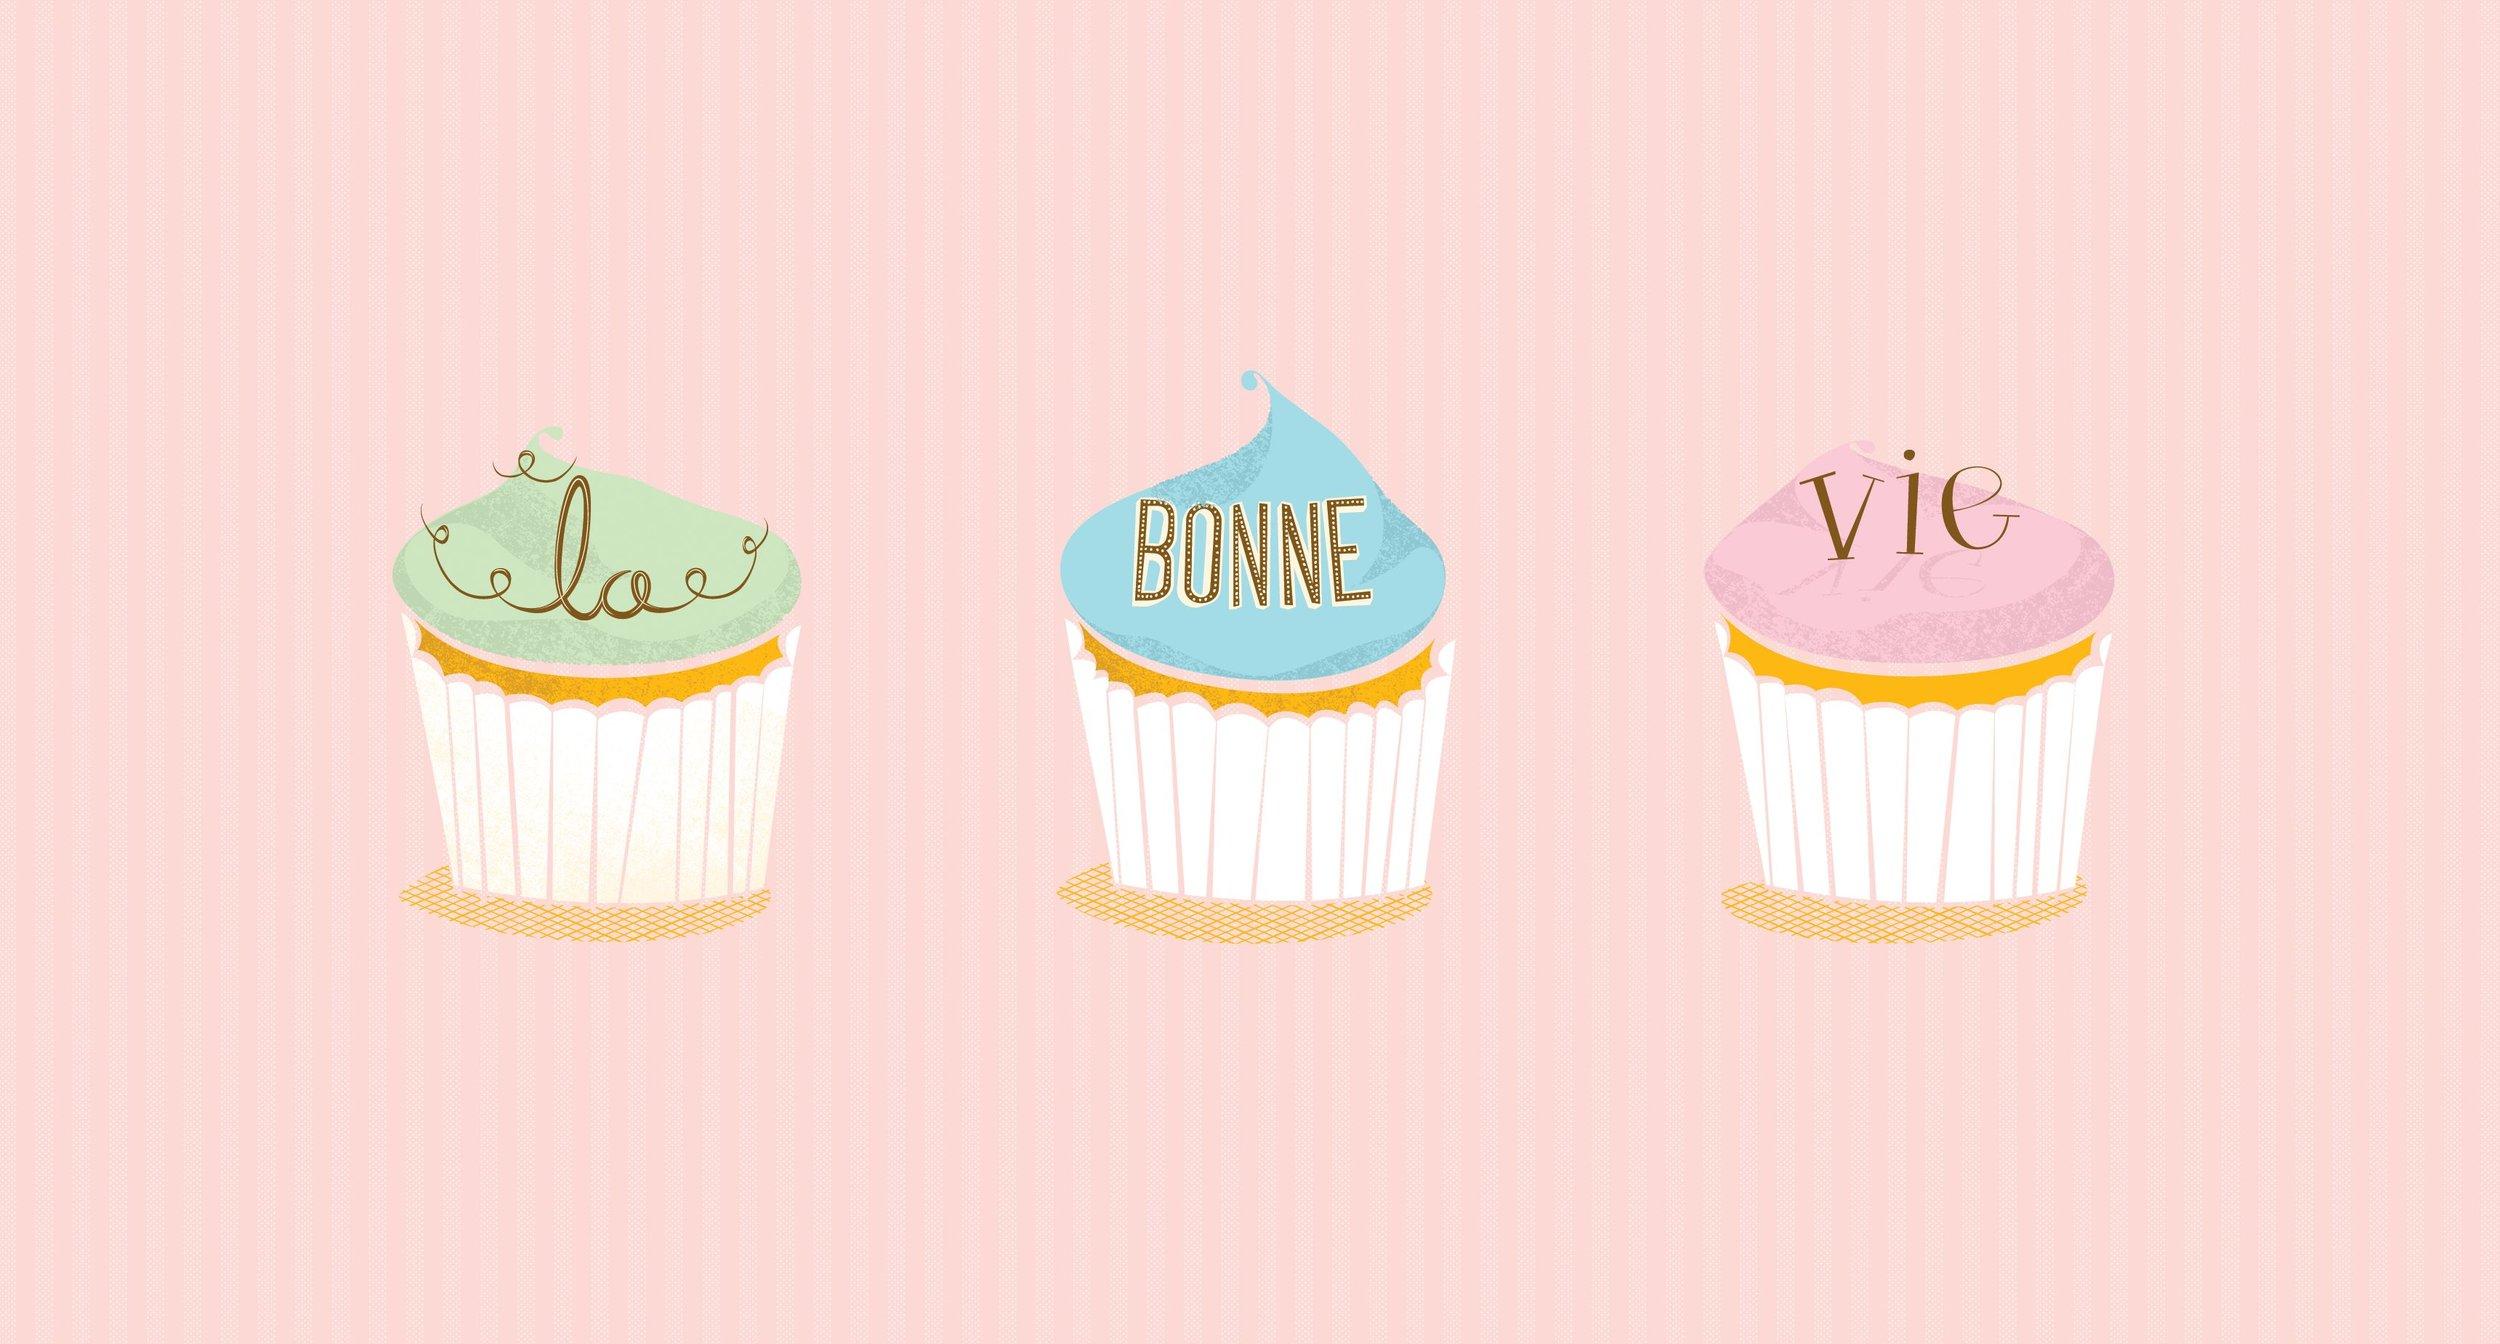 La Bonne Vie Cupcake Illustration